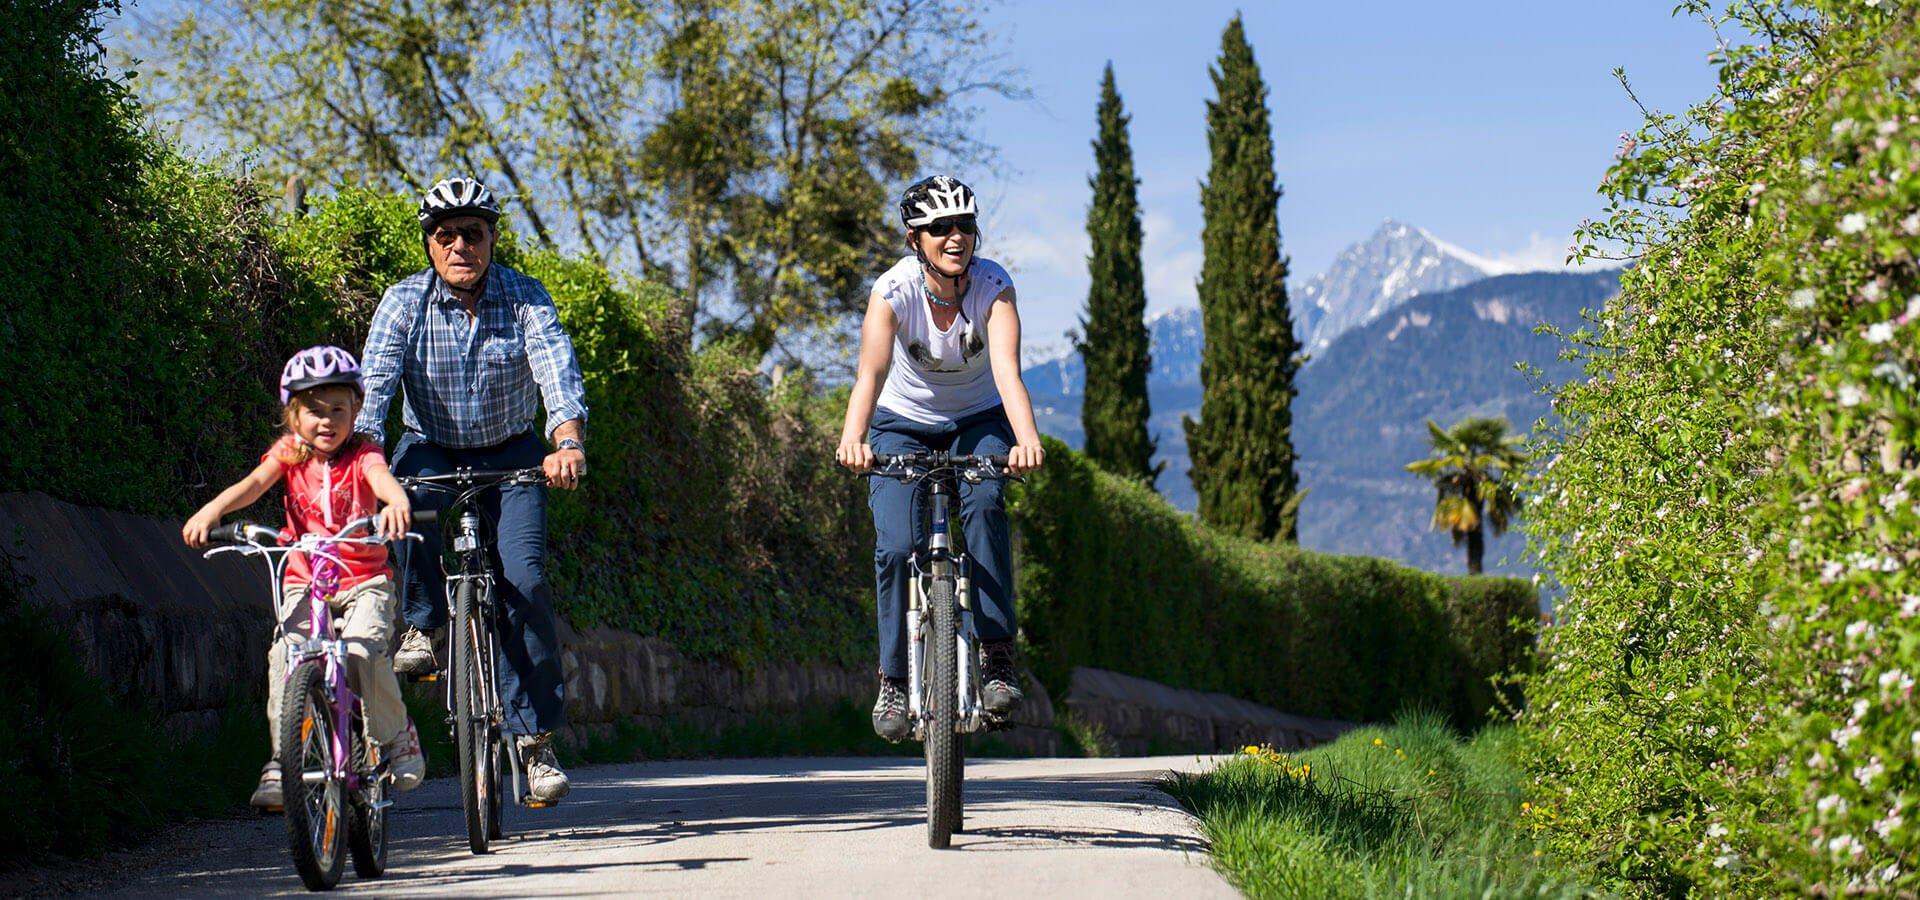 Urlaub in  Tisens - Südtirol - Fahrrad fahren